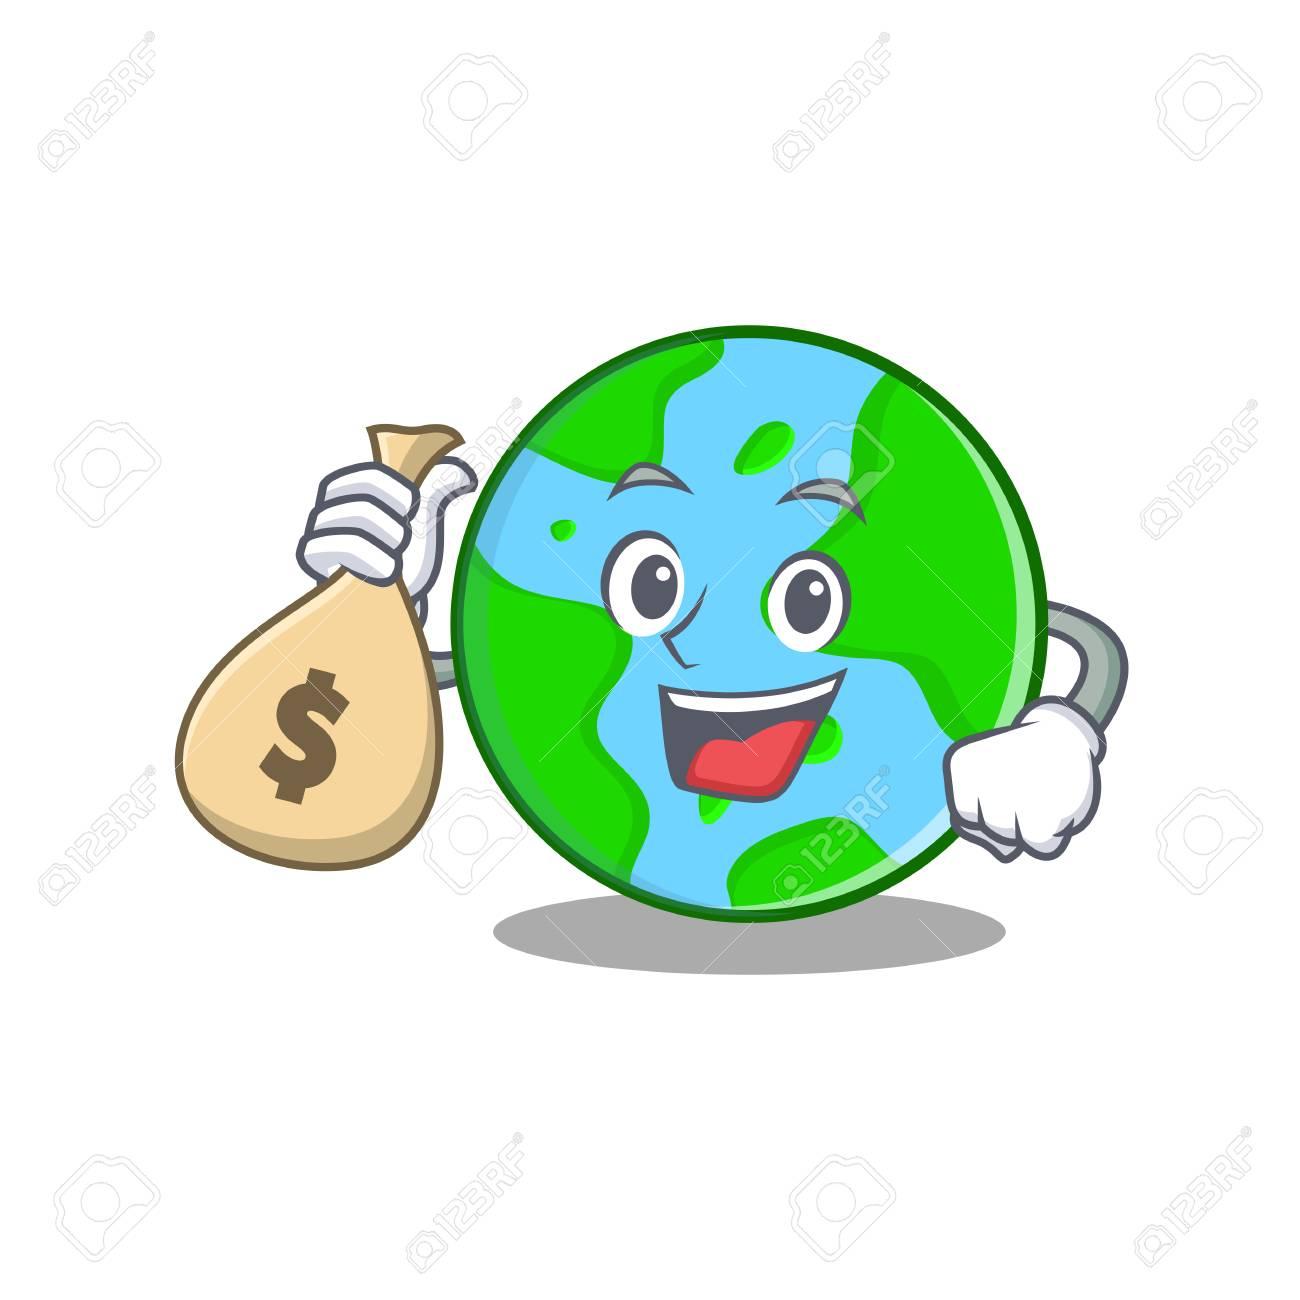 With Money Bag World Globe Character Cartoon Royalty Free Cliparts